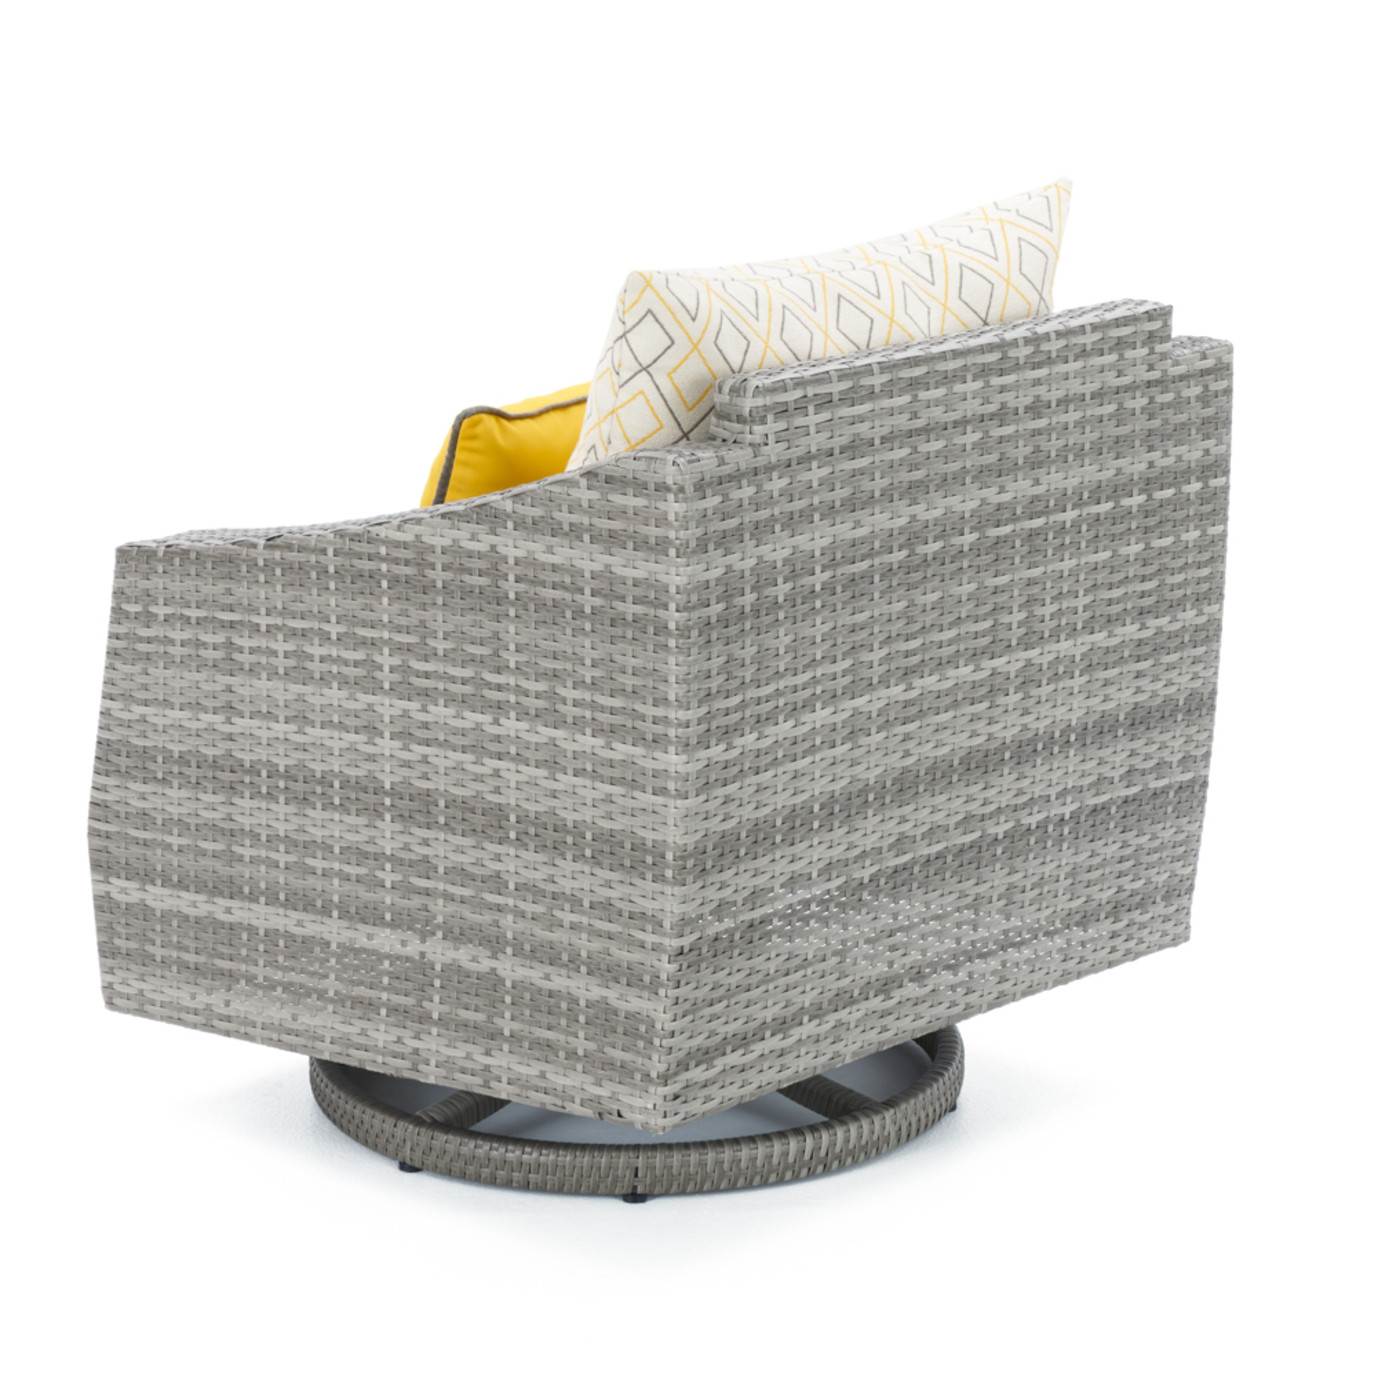 Cannes™ 8pc Sofa & Club Chair Set - Sunflower Yellow Design